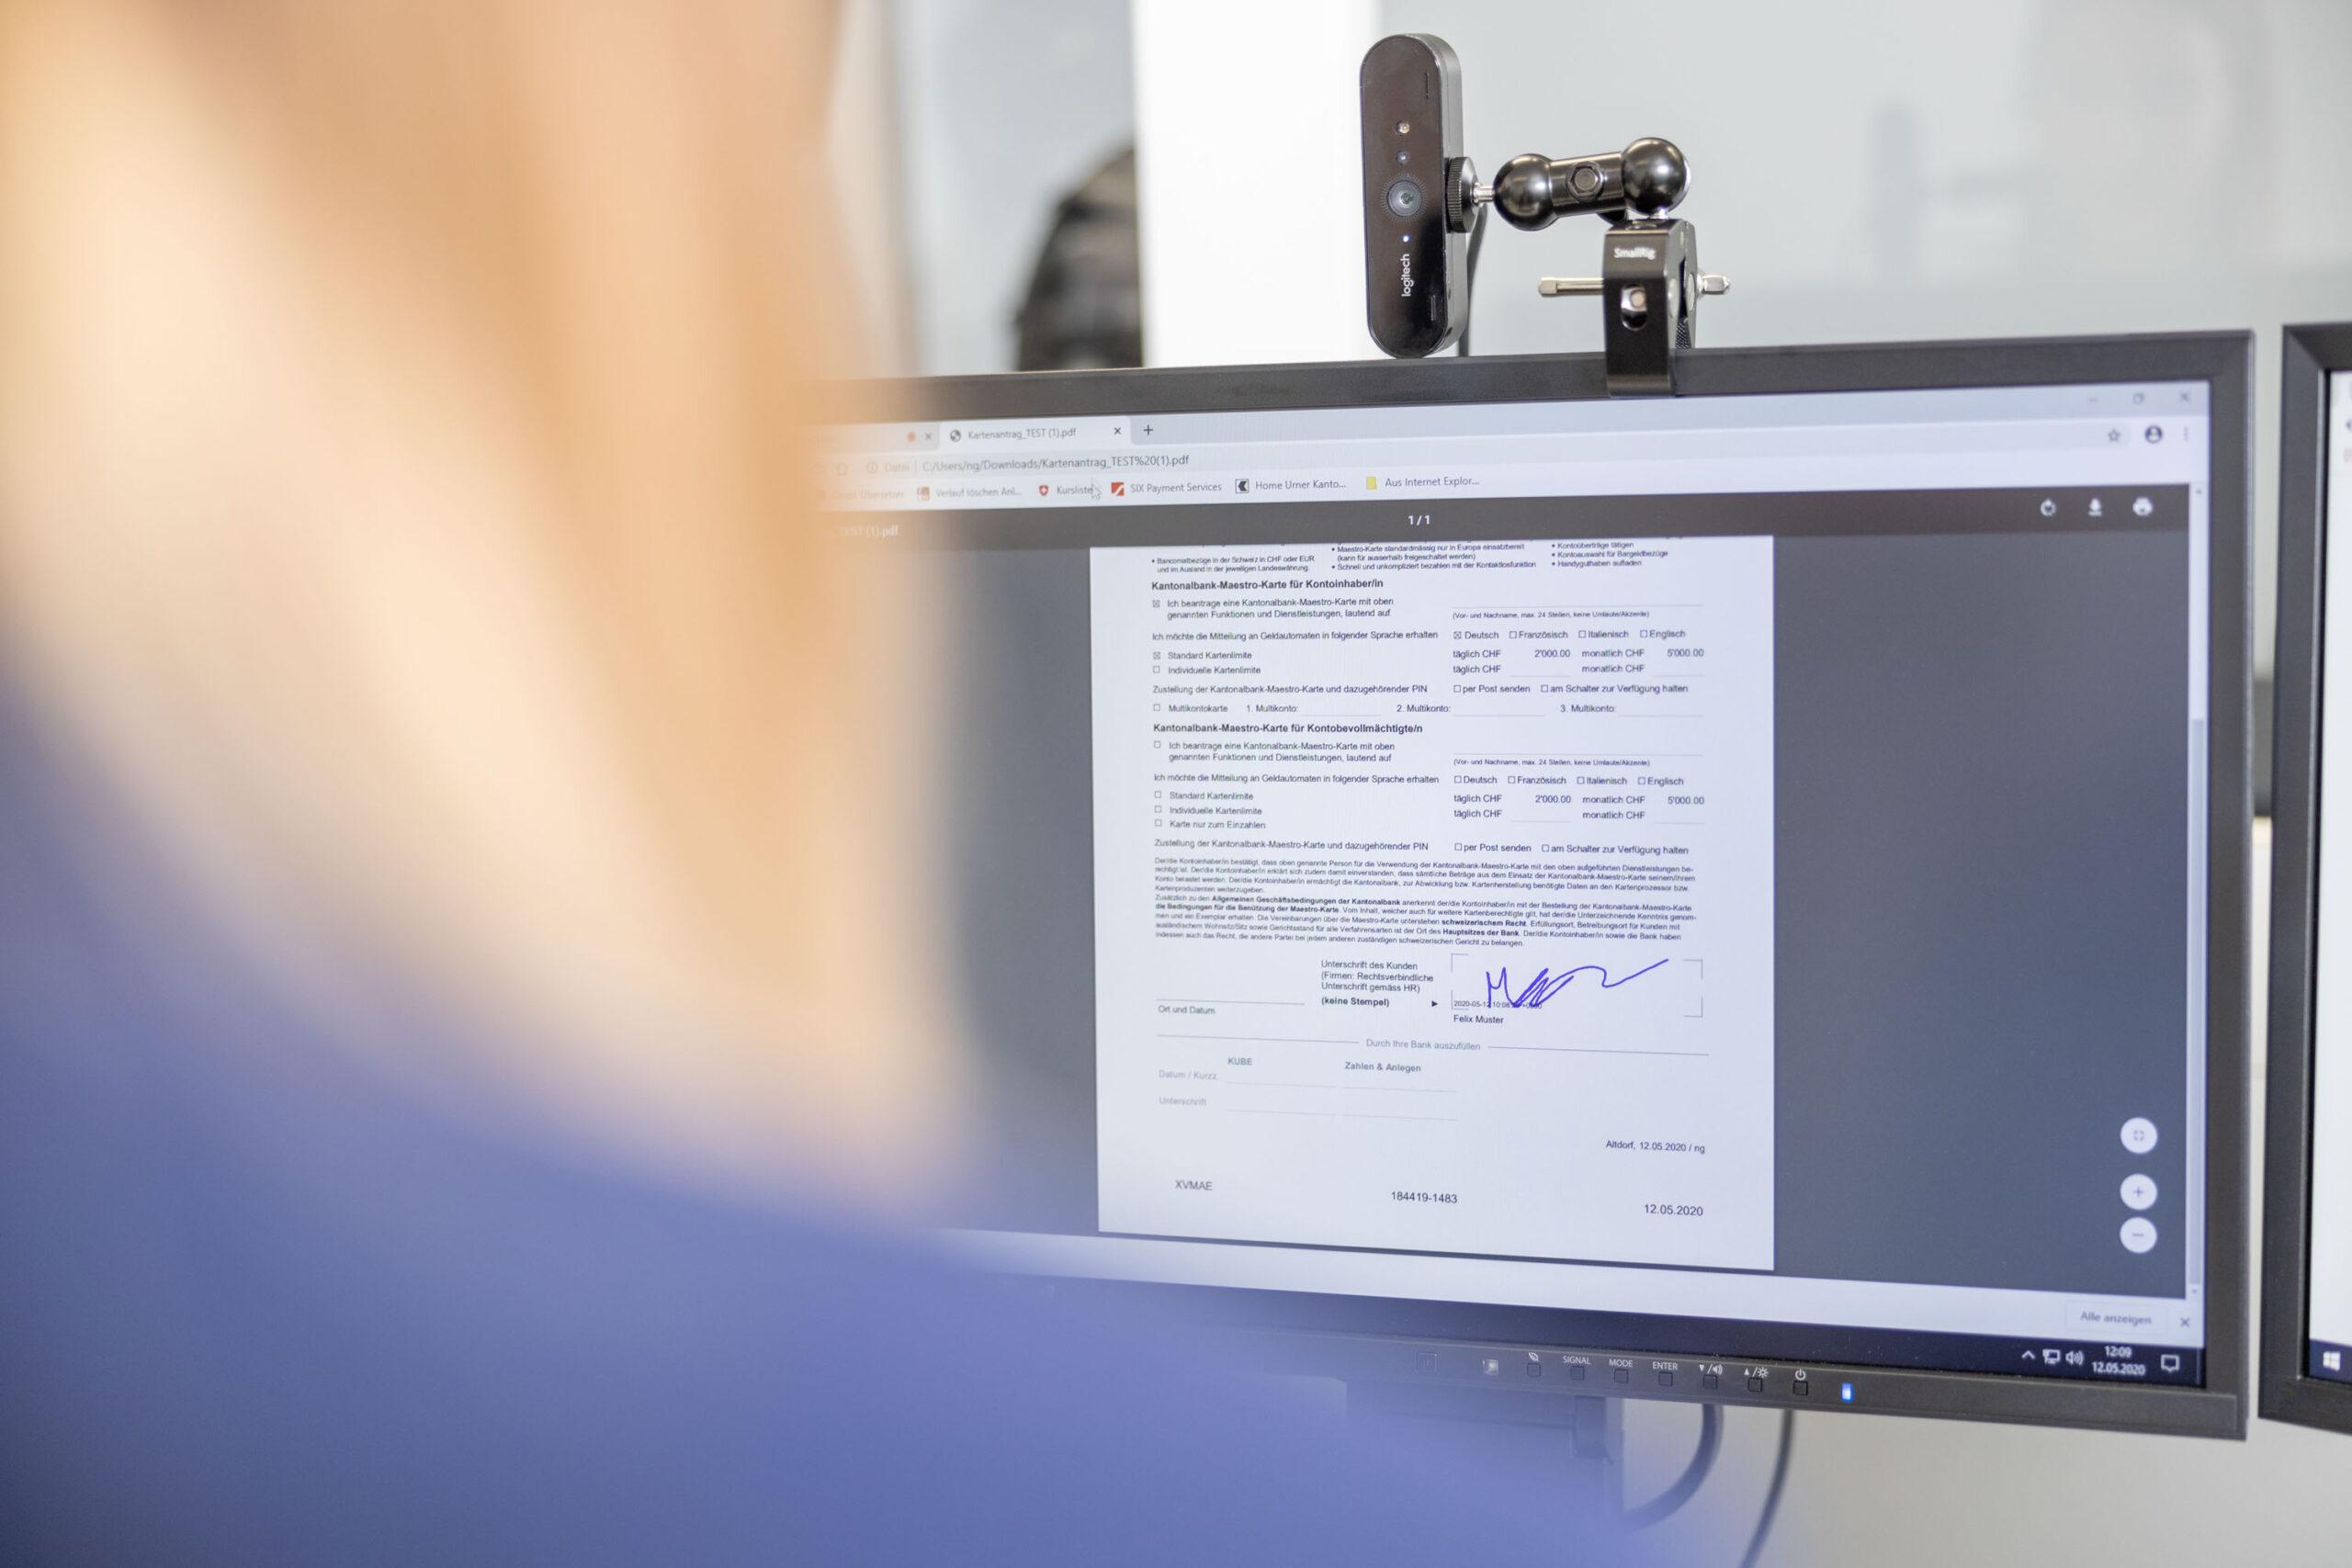 Werbefotografie Meier & Kamer: Reportage für externe Kommunikation Videoservice Kantonalbank (UKB)